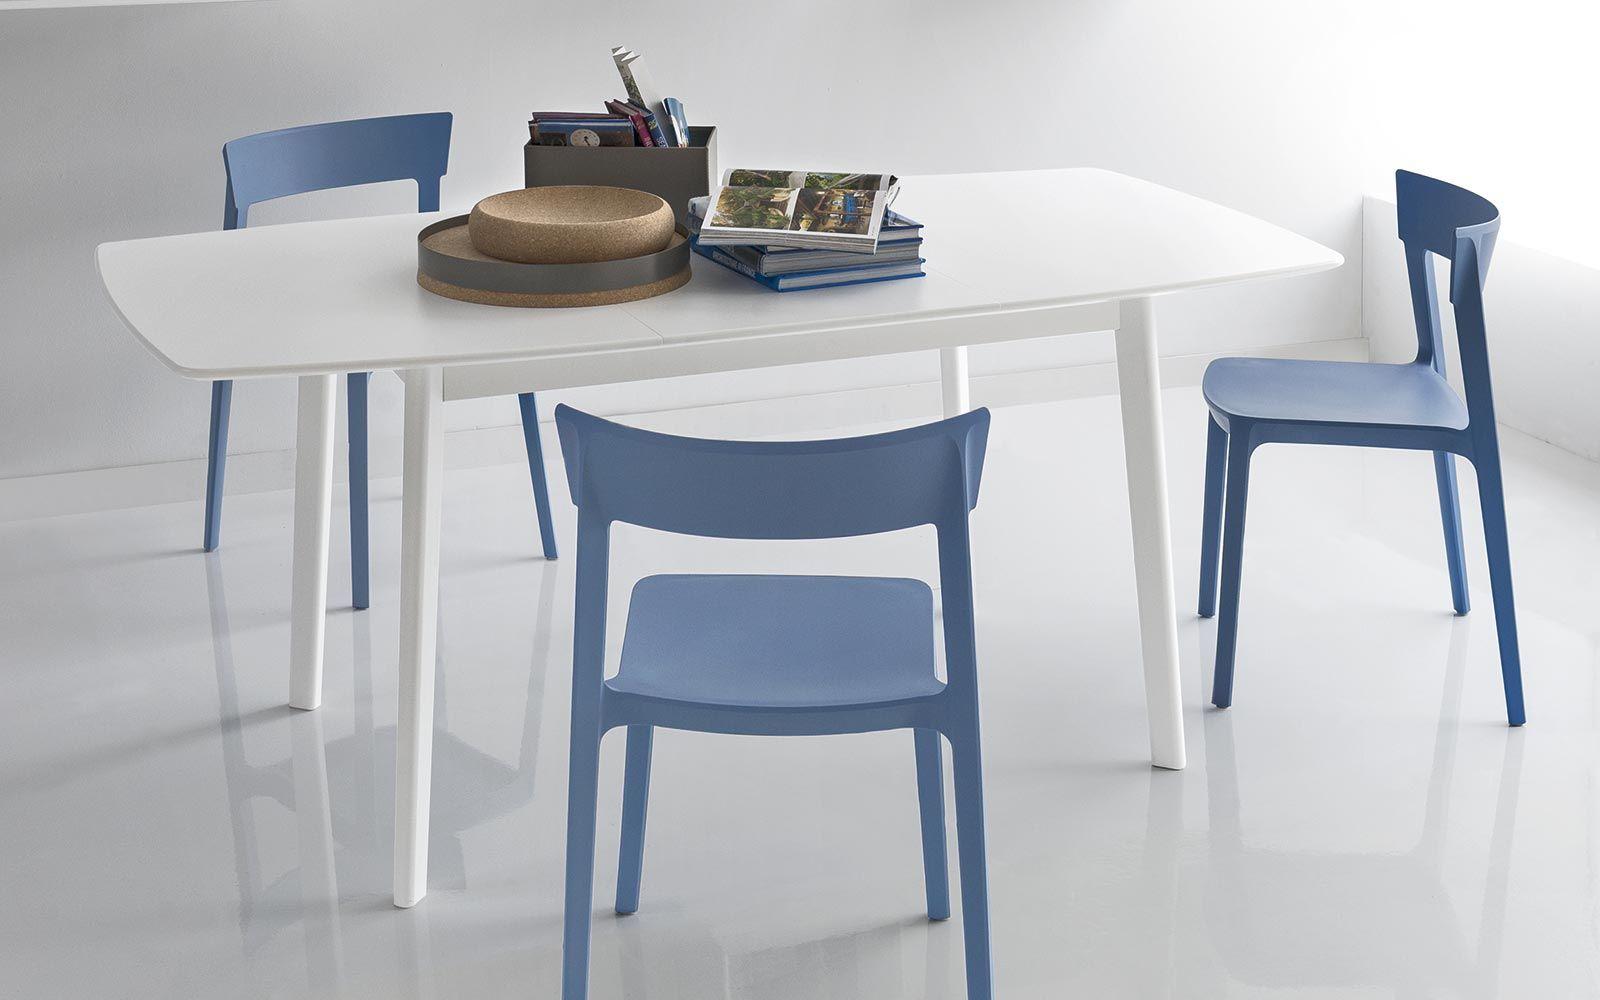 sedia skin calligaris blu | la cocina | pinterest | sedie moderne ... - Sedie Cucina Scontate Calligaris